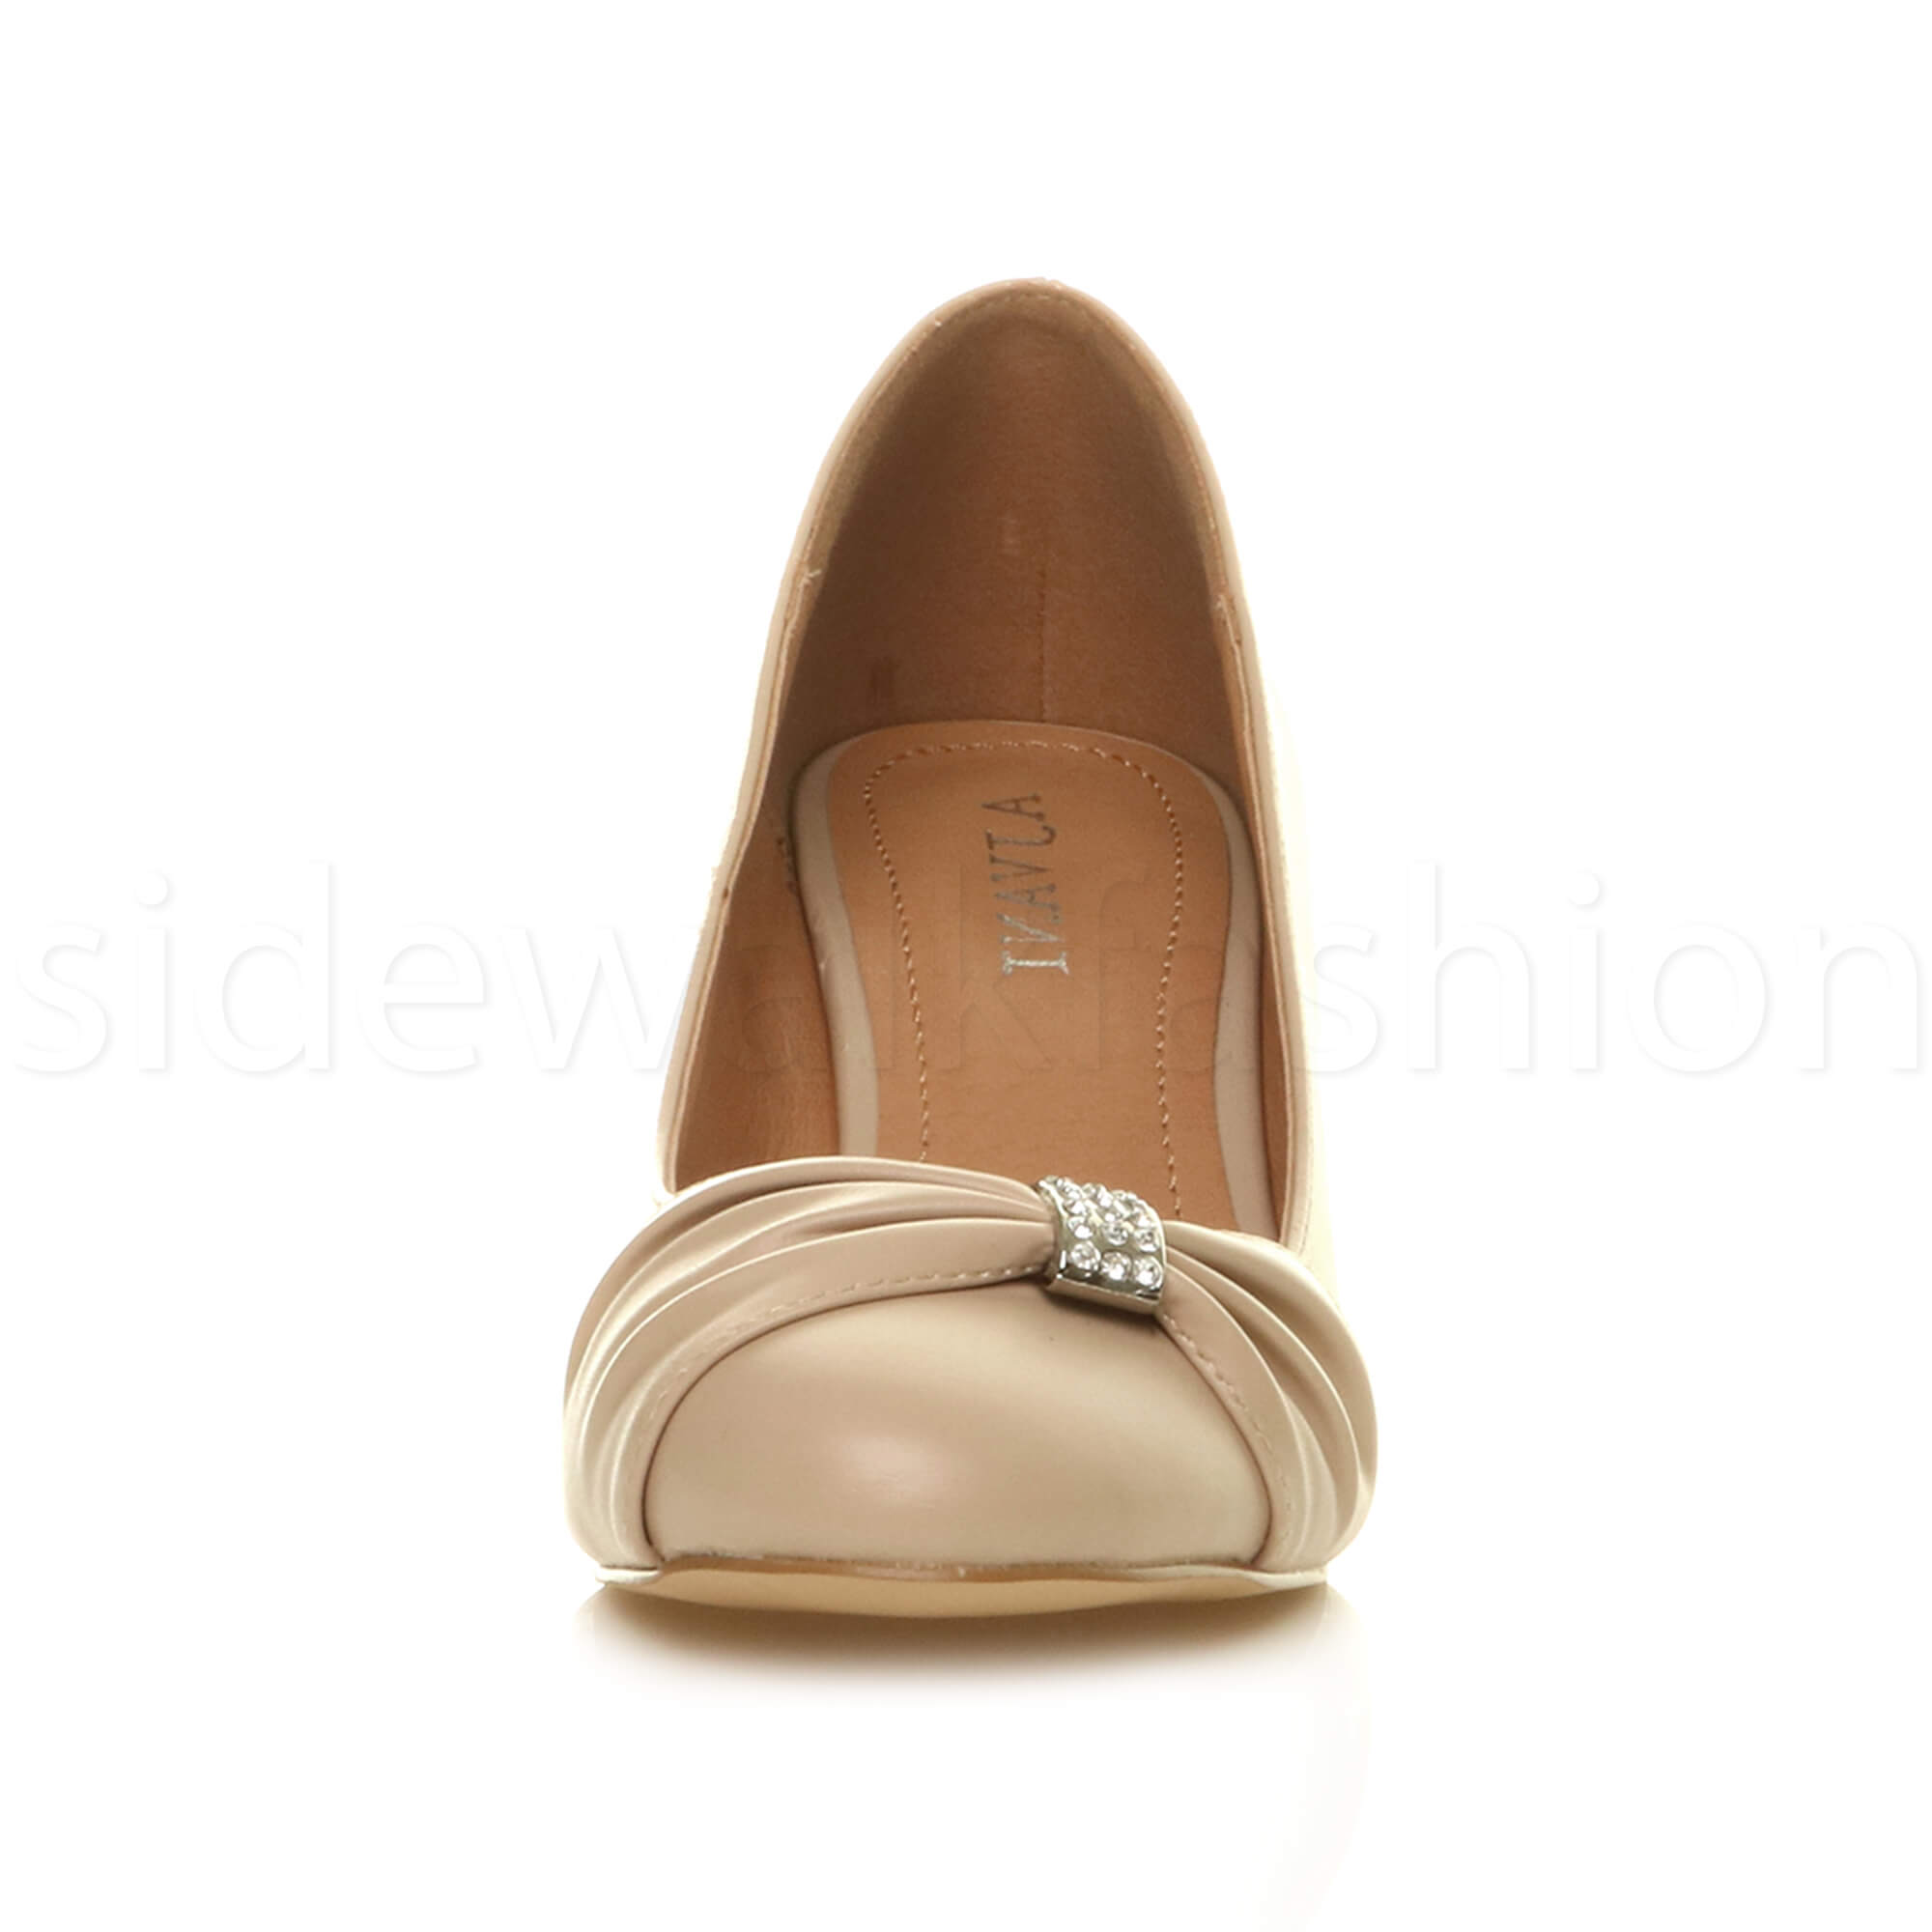 Womens-ladies-low-mid-heel-diamante-party-smart-evening-court-shoes-size thumbnail 63